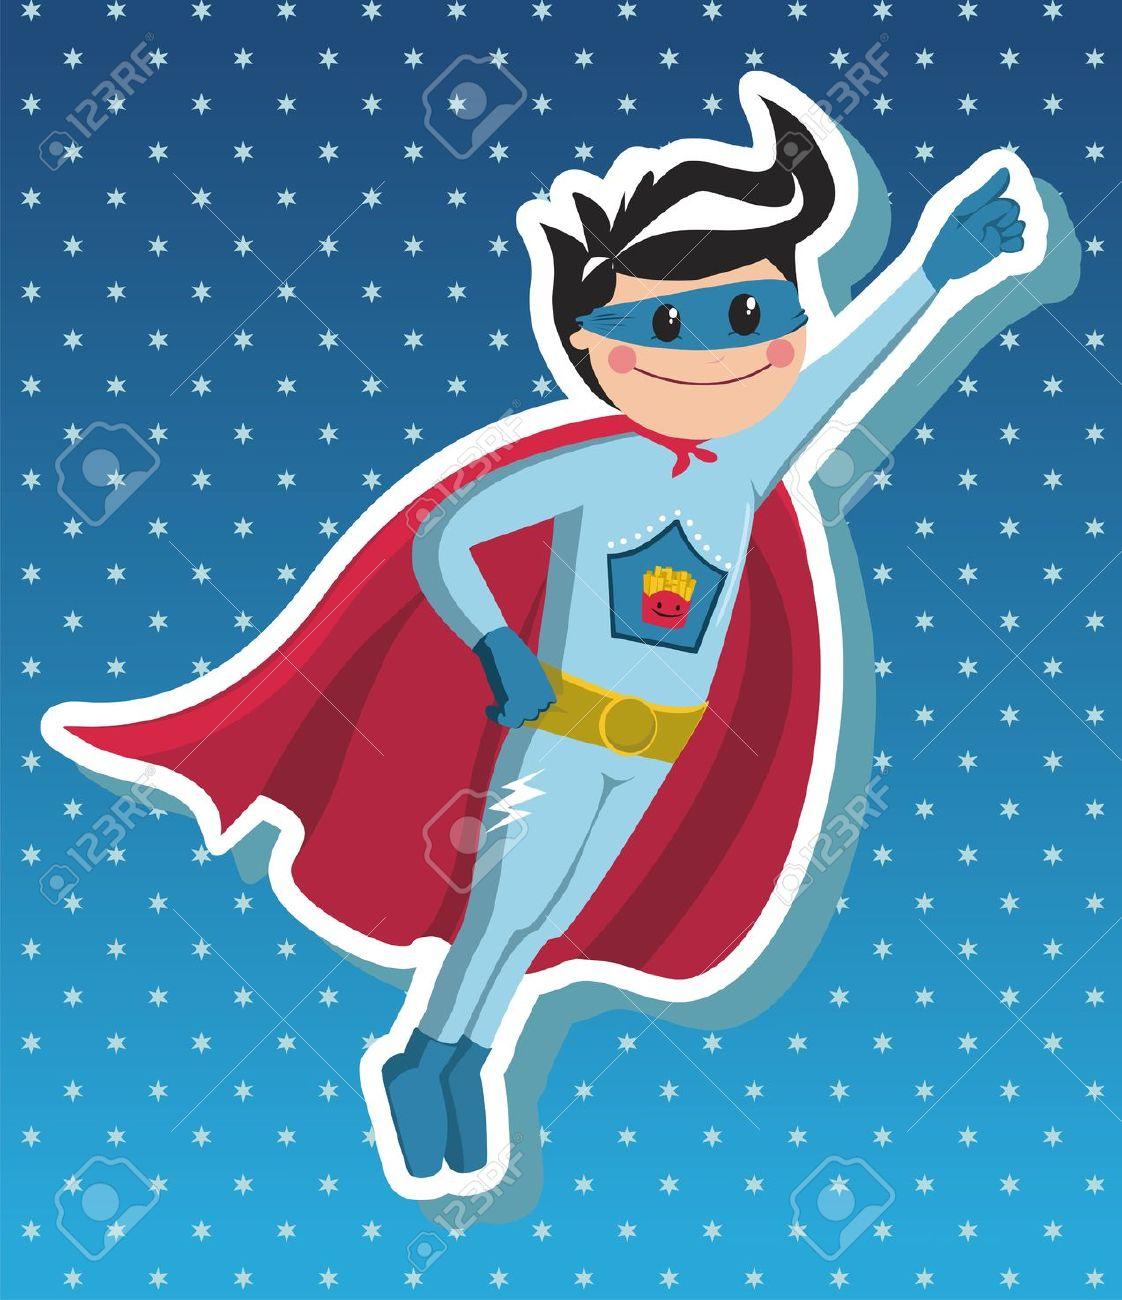 Boy Superhero Volare Su Sfondo Blu Con Stelline Clipart Royalty.